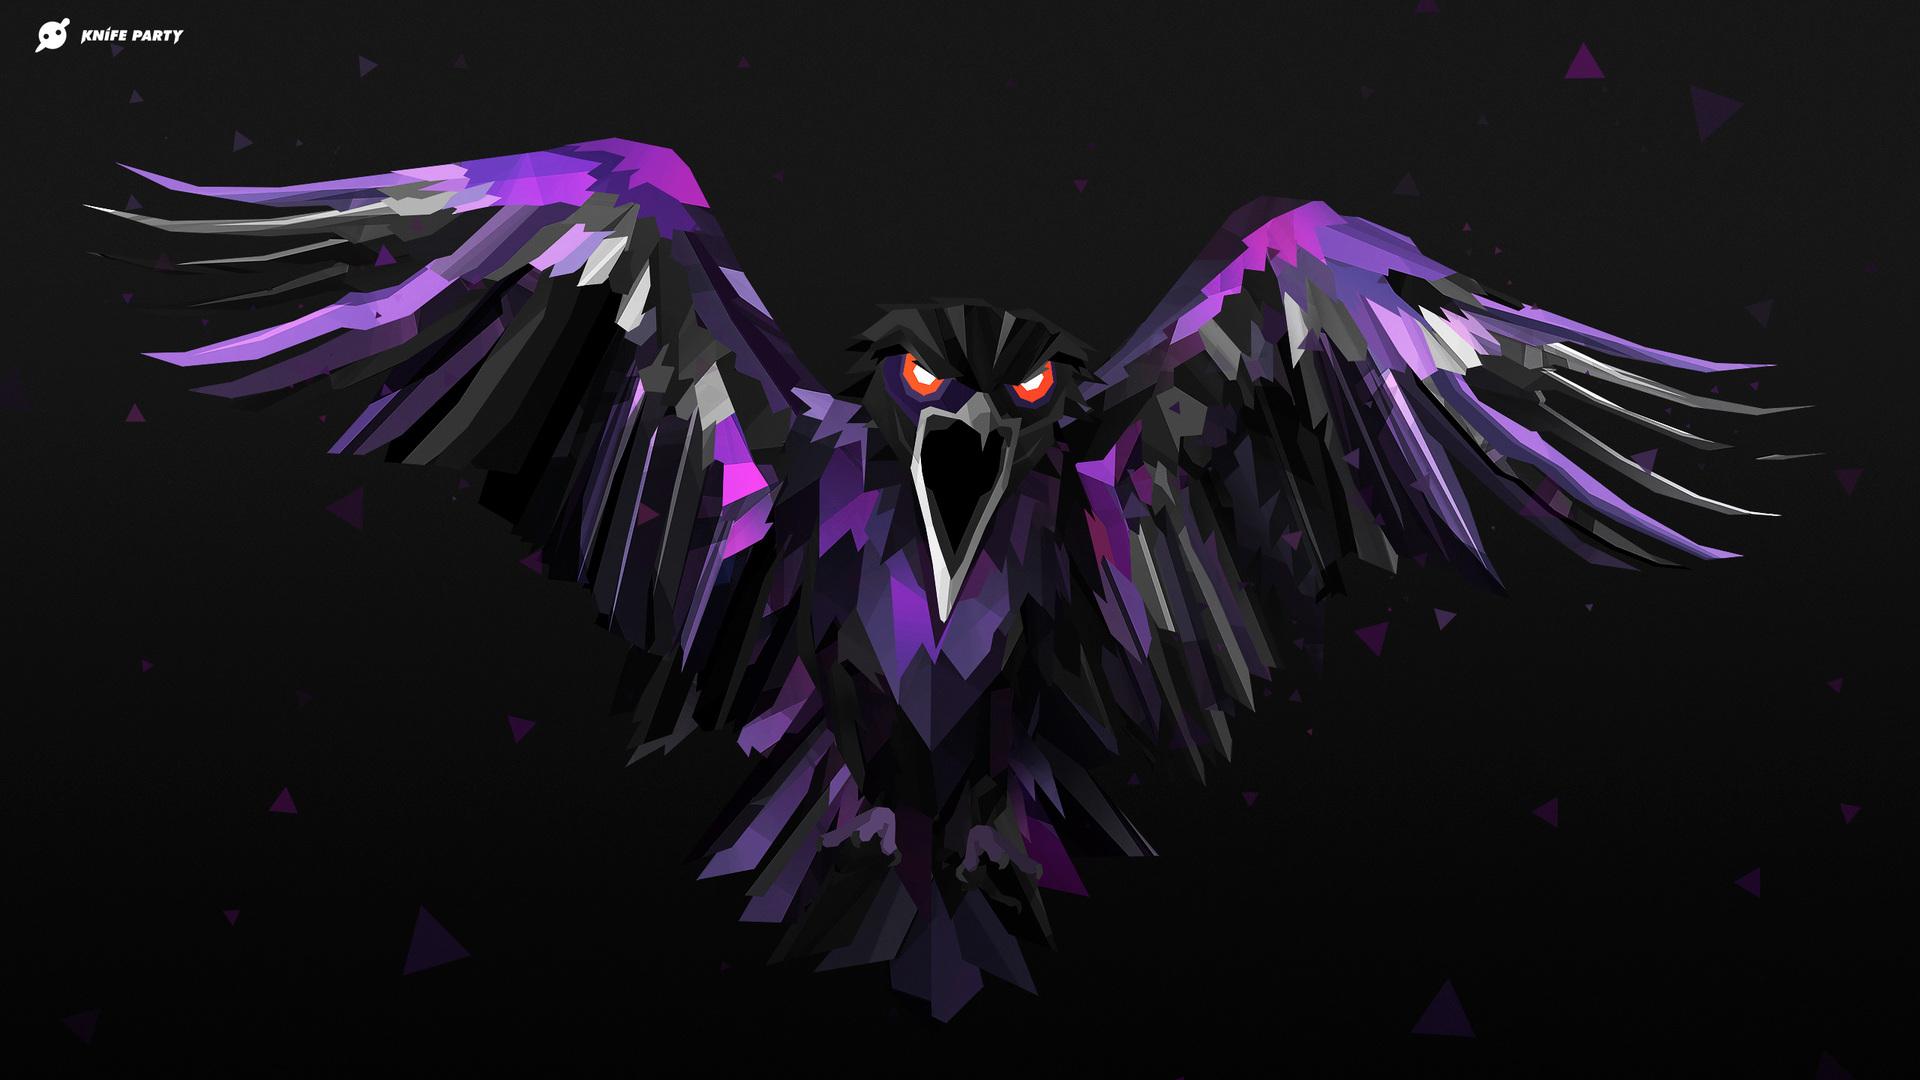 1920x1080 Bird Polygon Digital Art Laptop Full Hd 1080p Hd 4k